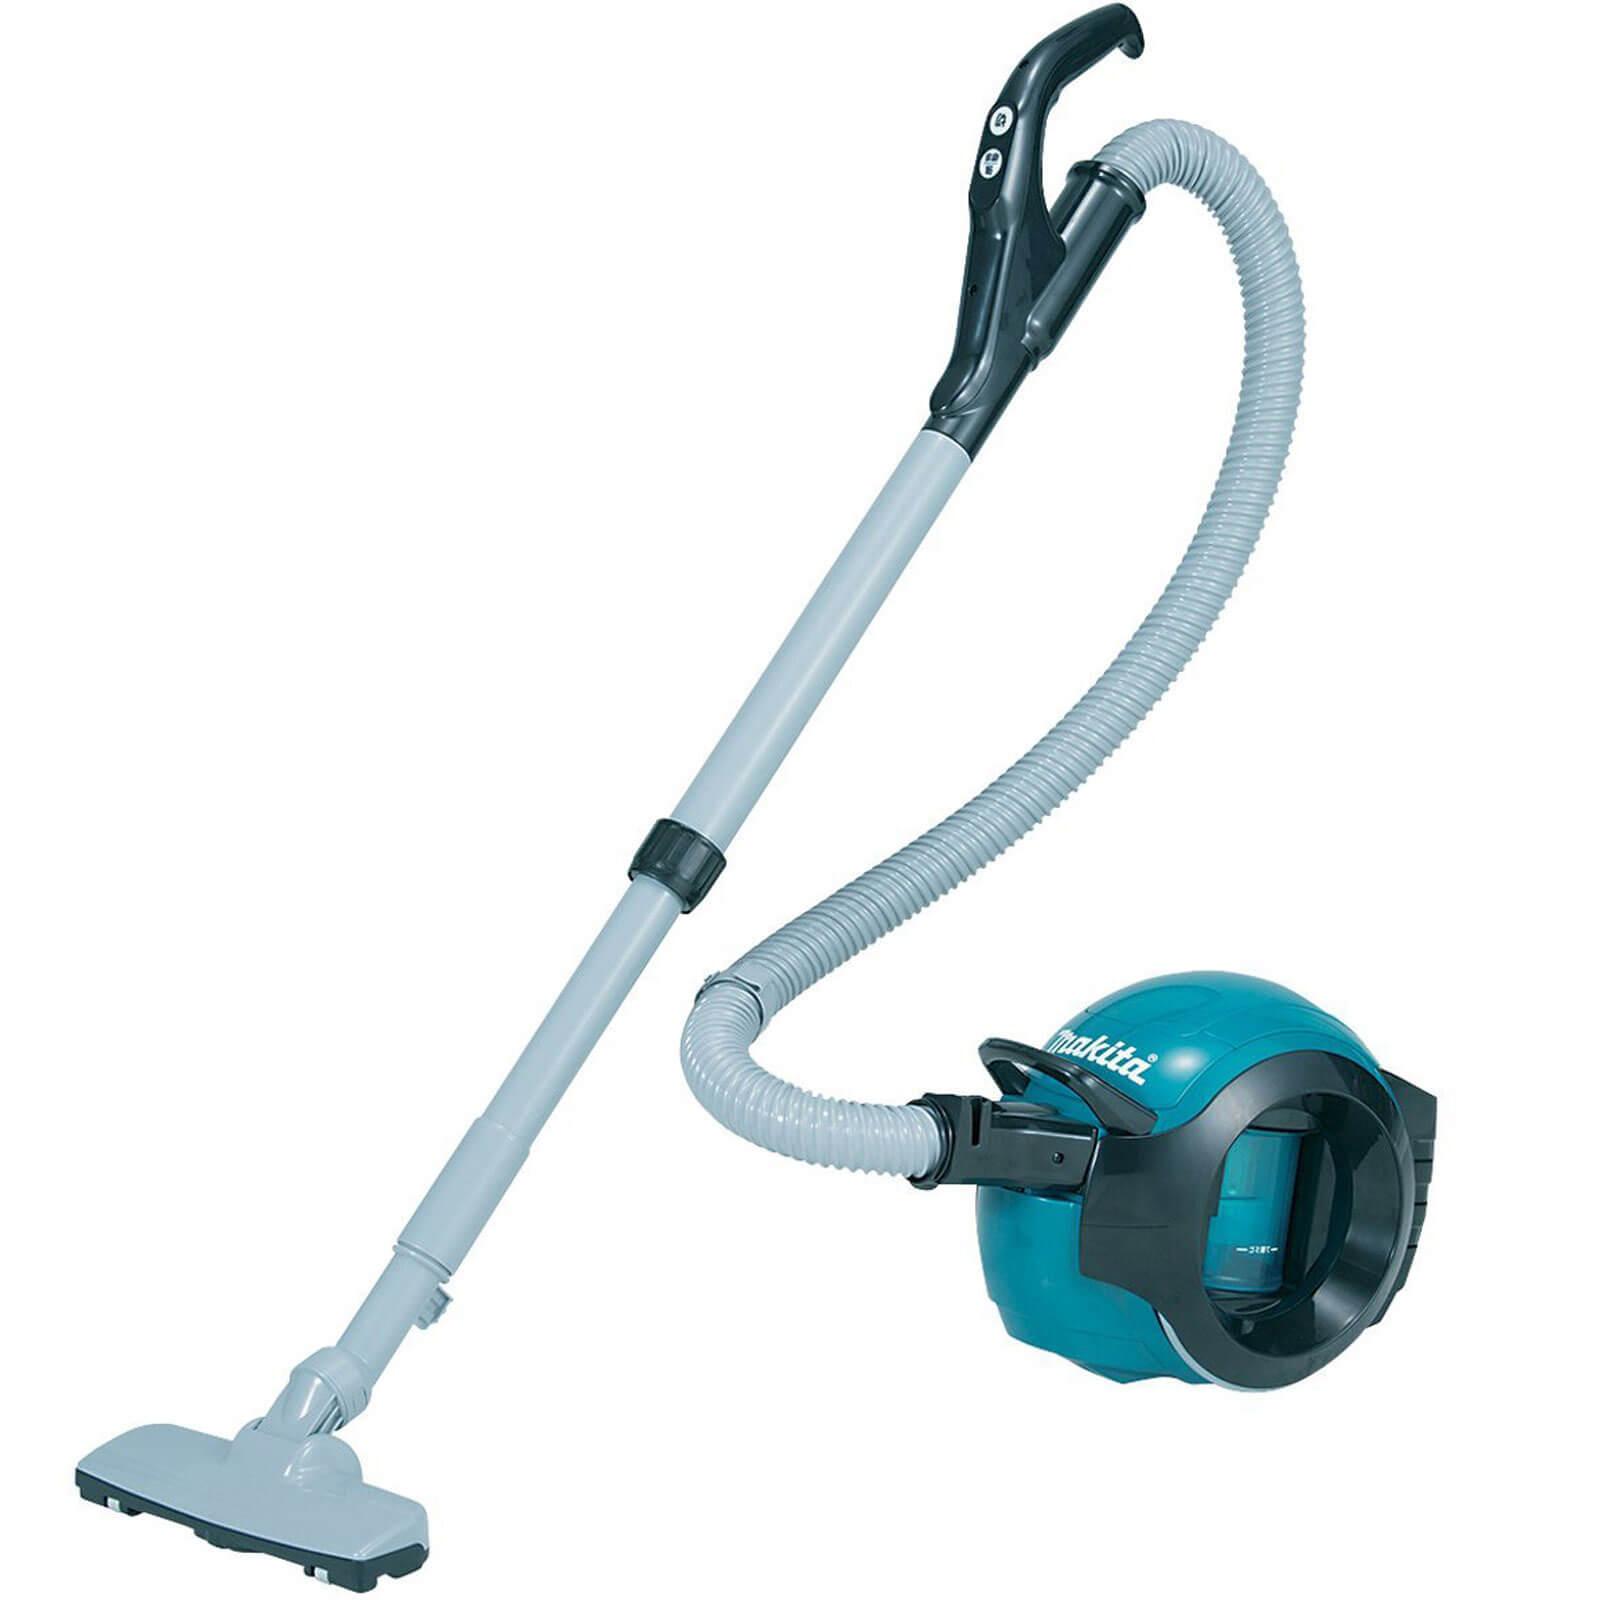 Makita rechargeable handy cleaner vacuum cleaner makita CL182FDRFW JP